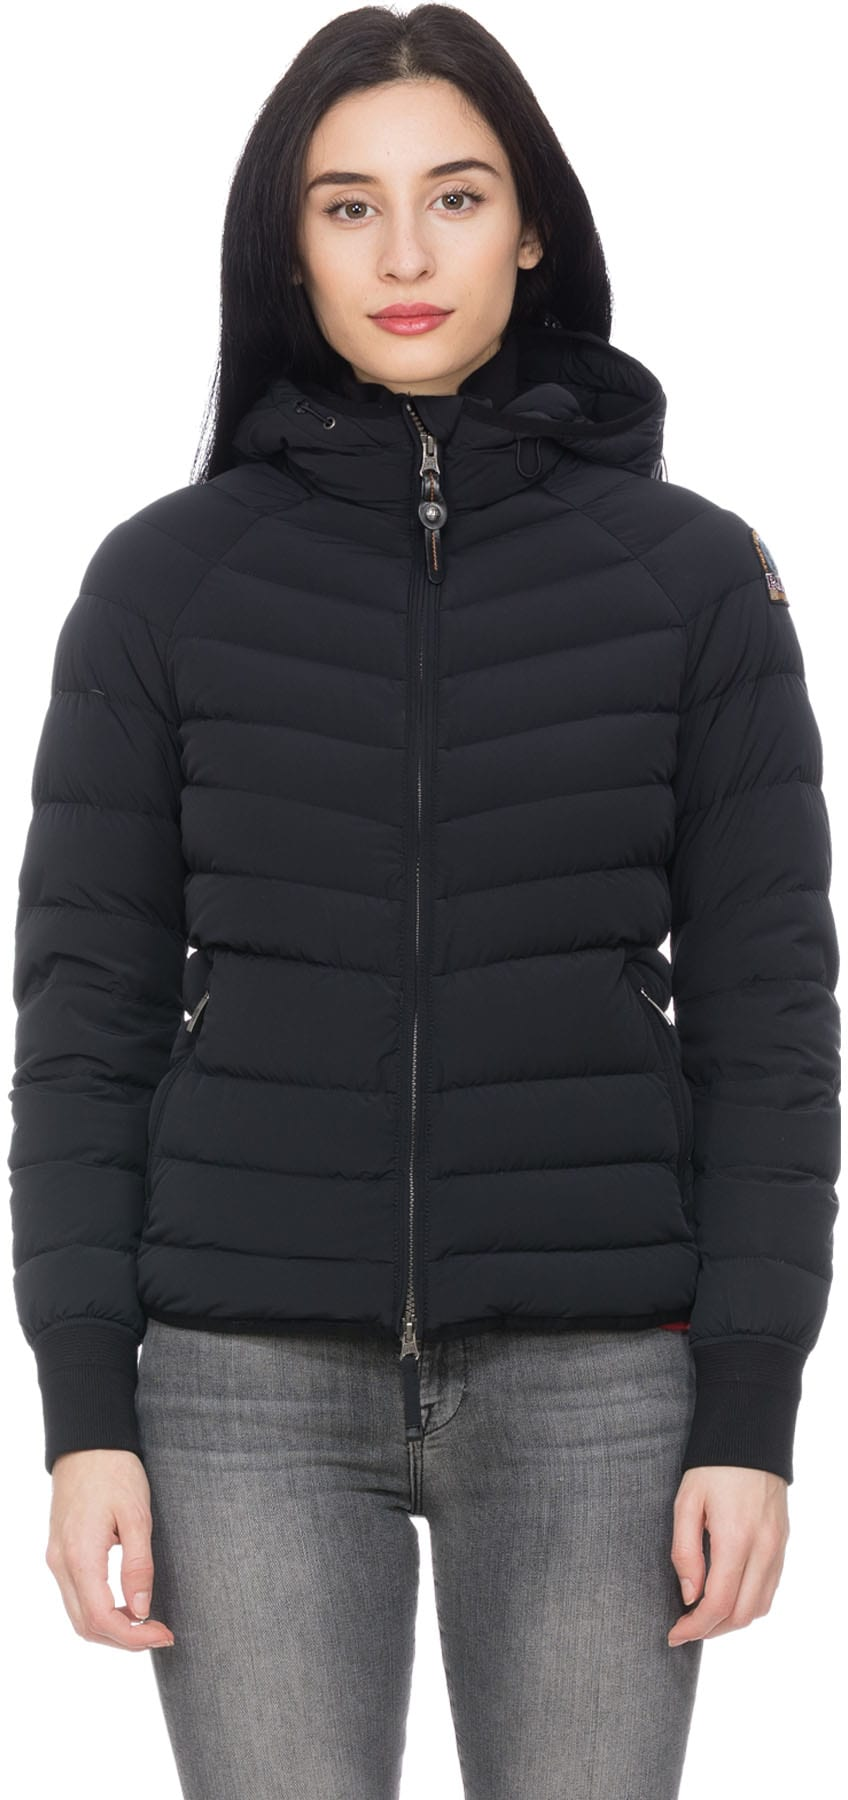 SHOP Women - PARAJUMPERS: Alicia Light Weight Varsity Jacket - Black -  Coats & Jackets, Lightweight | INFLUENCE U